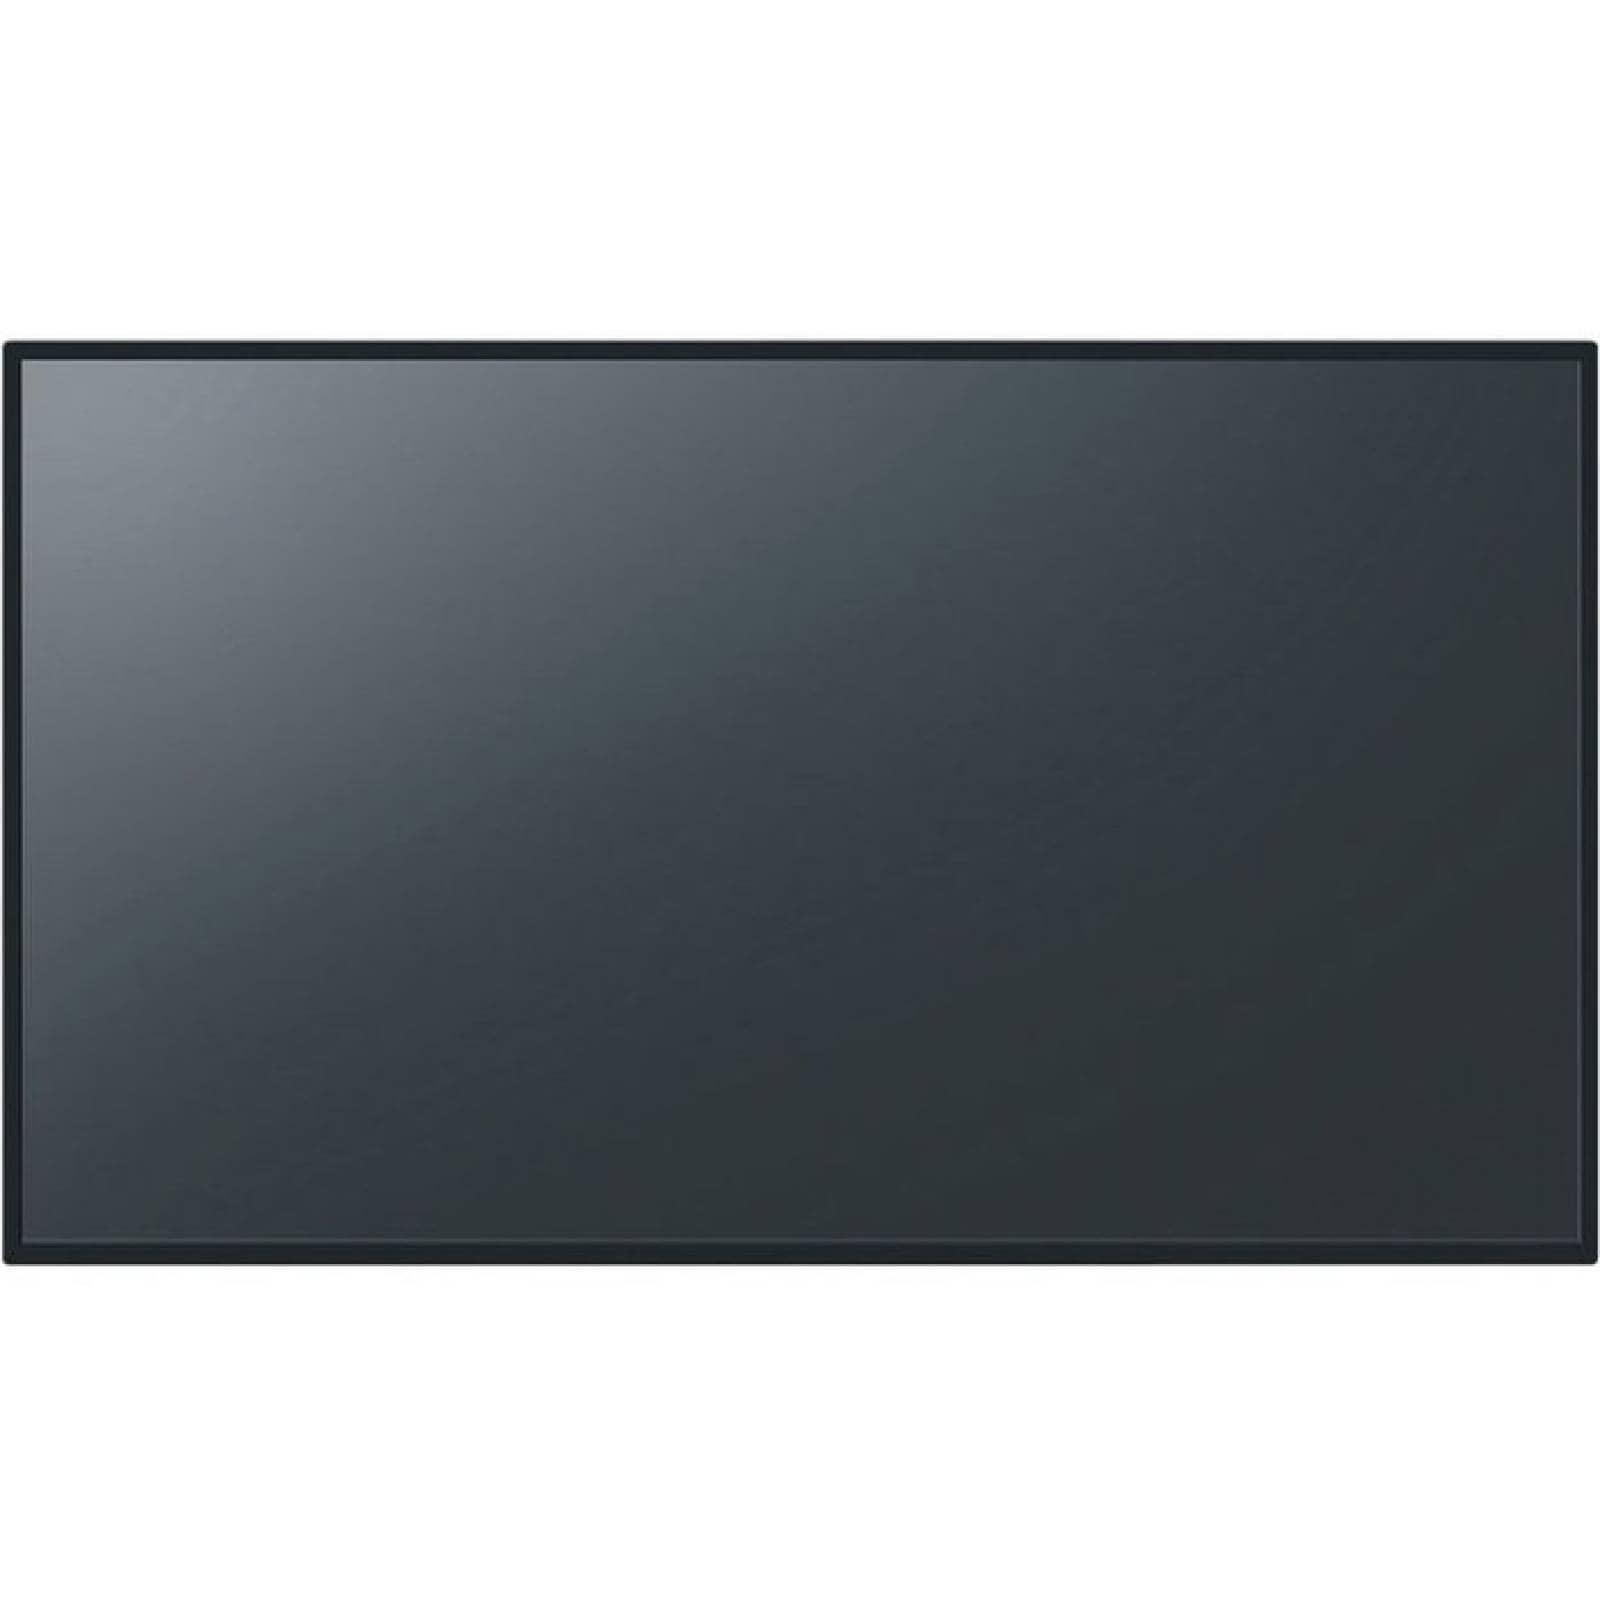 Pantalla LCD Full HD de clase 43 de Panasonic TH43LFE8U